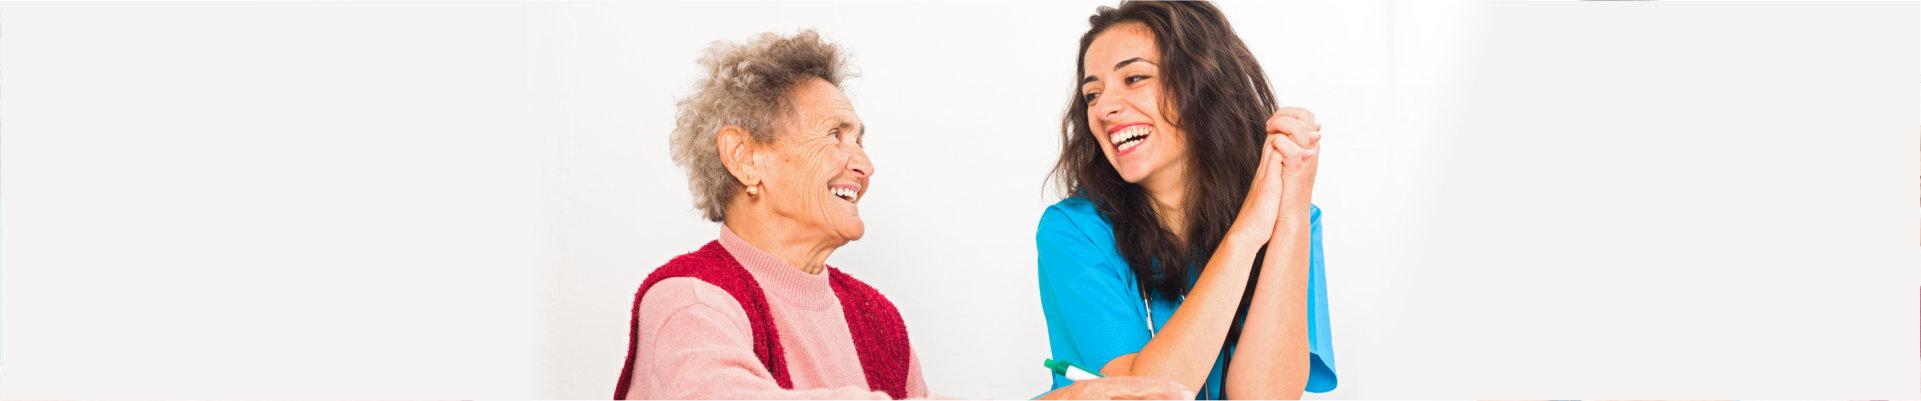 senior woman with kind caregiver